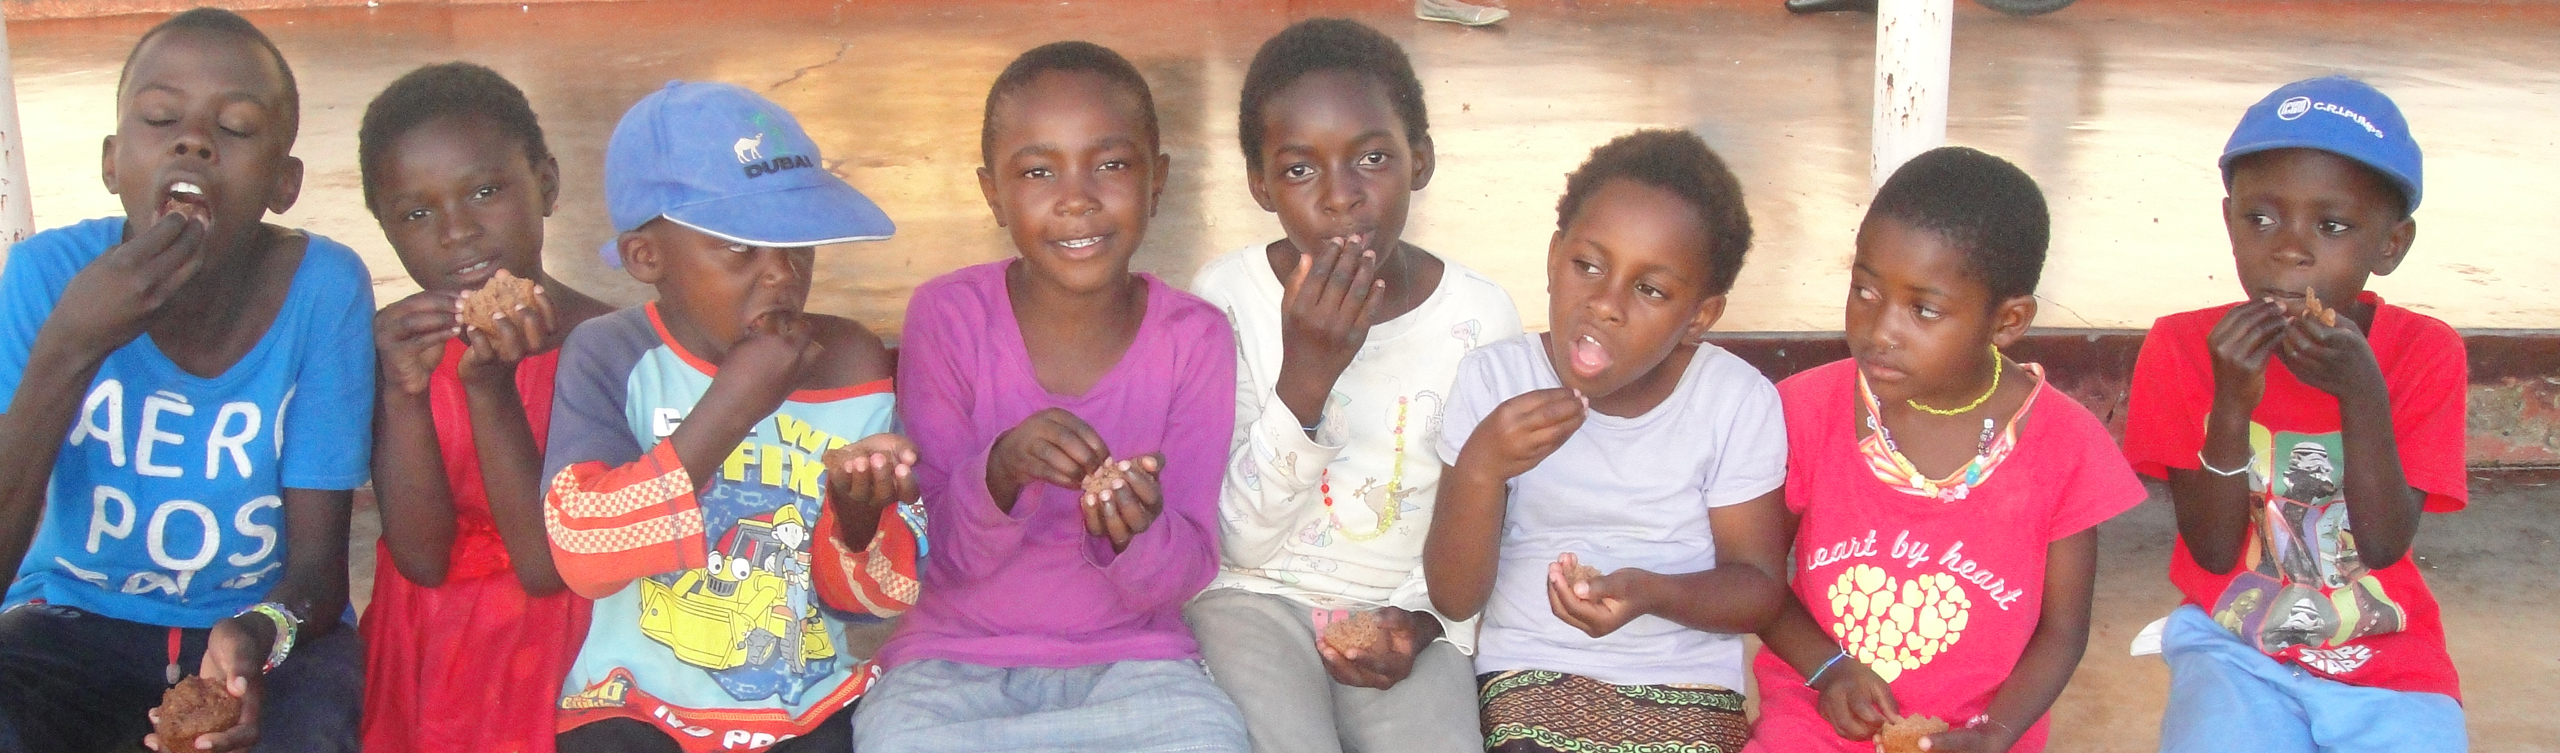 Children in Zambia